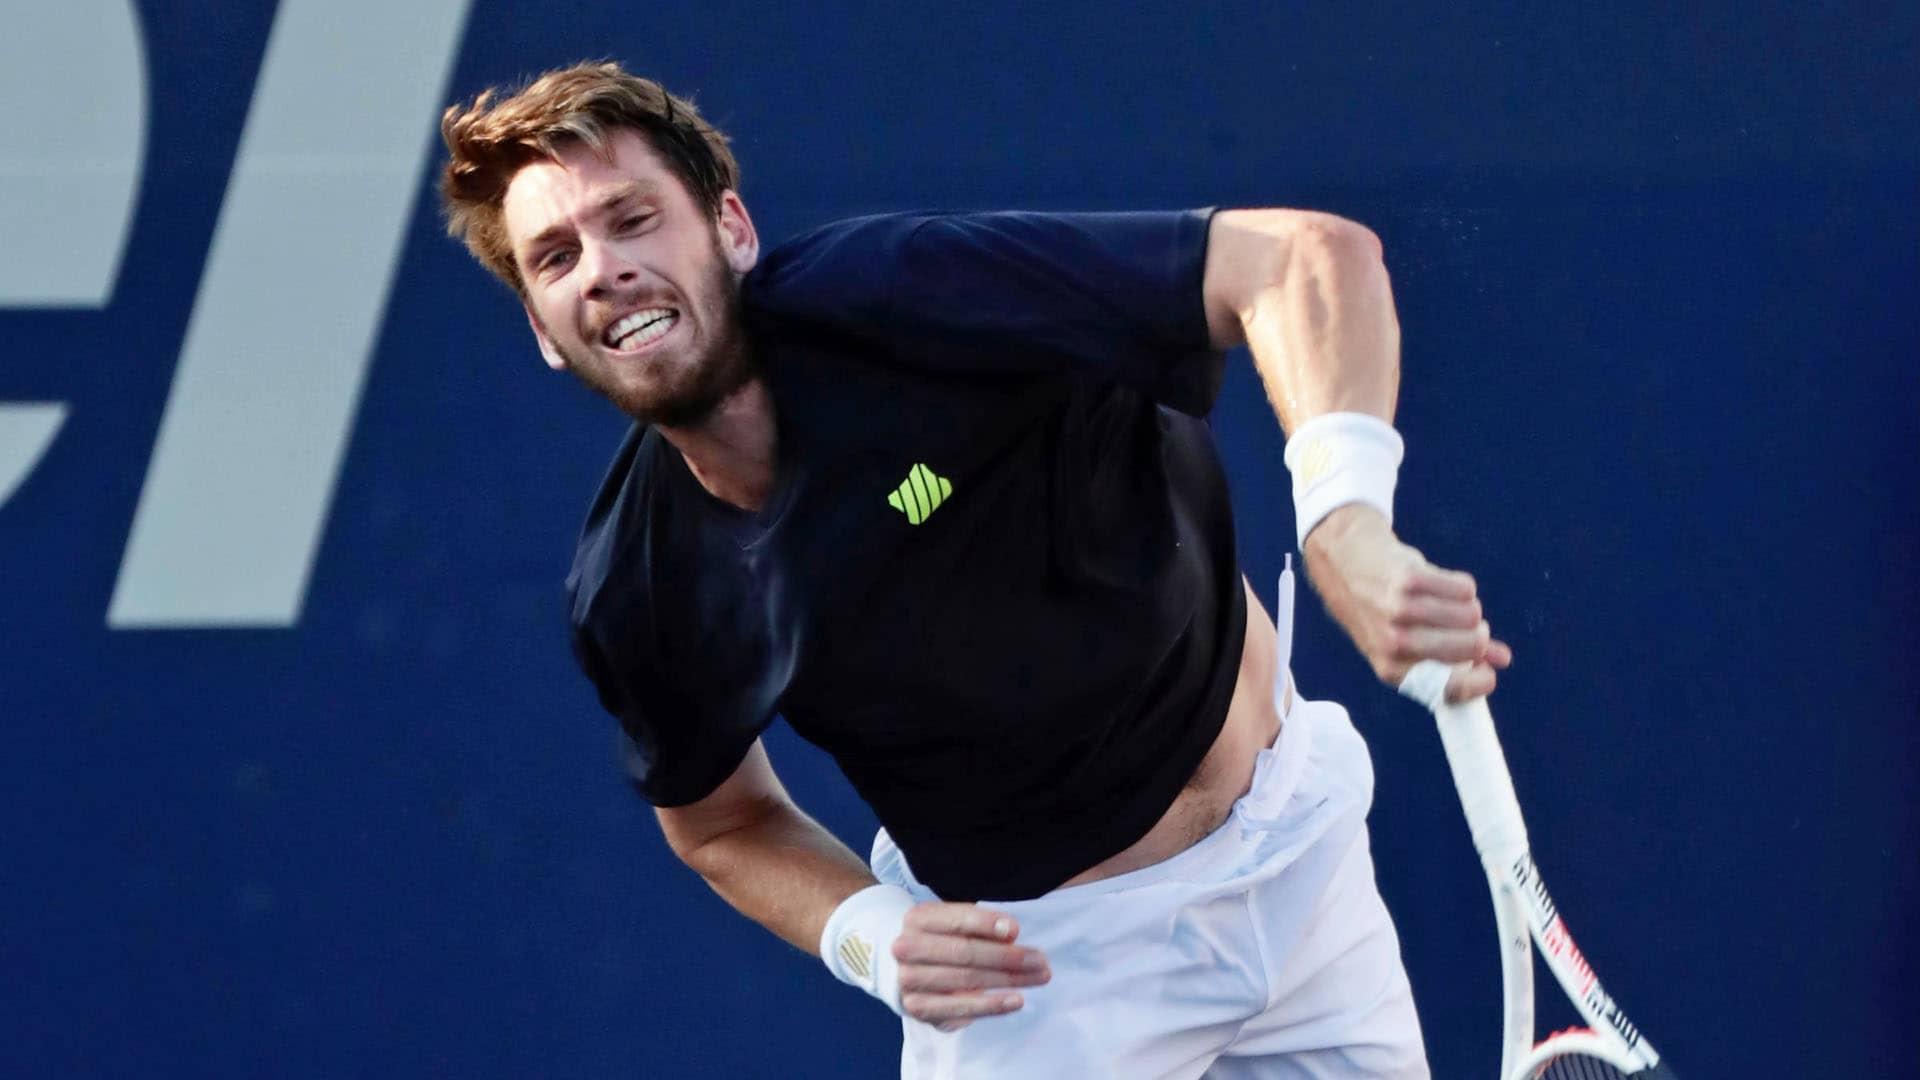 norrie los cabos 2021 wednesday serve - ATP Los Cabos: Norrie gladko odpravil Američana Fritza